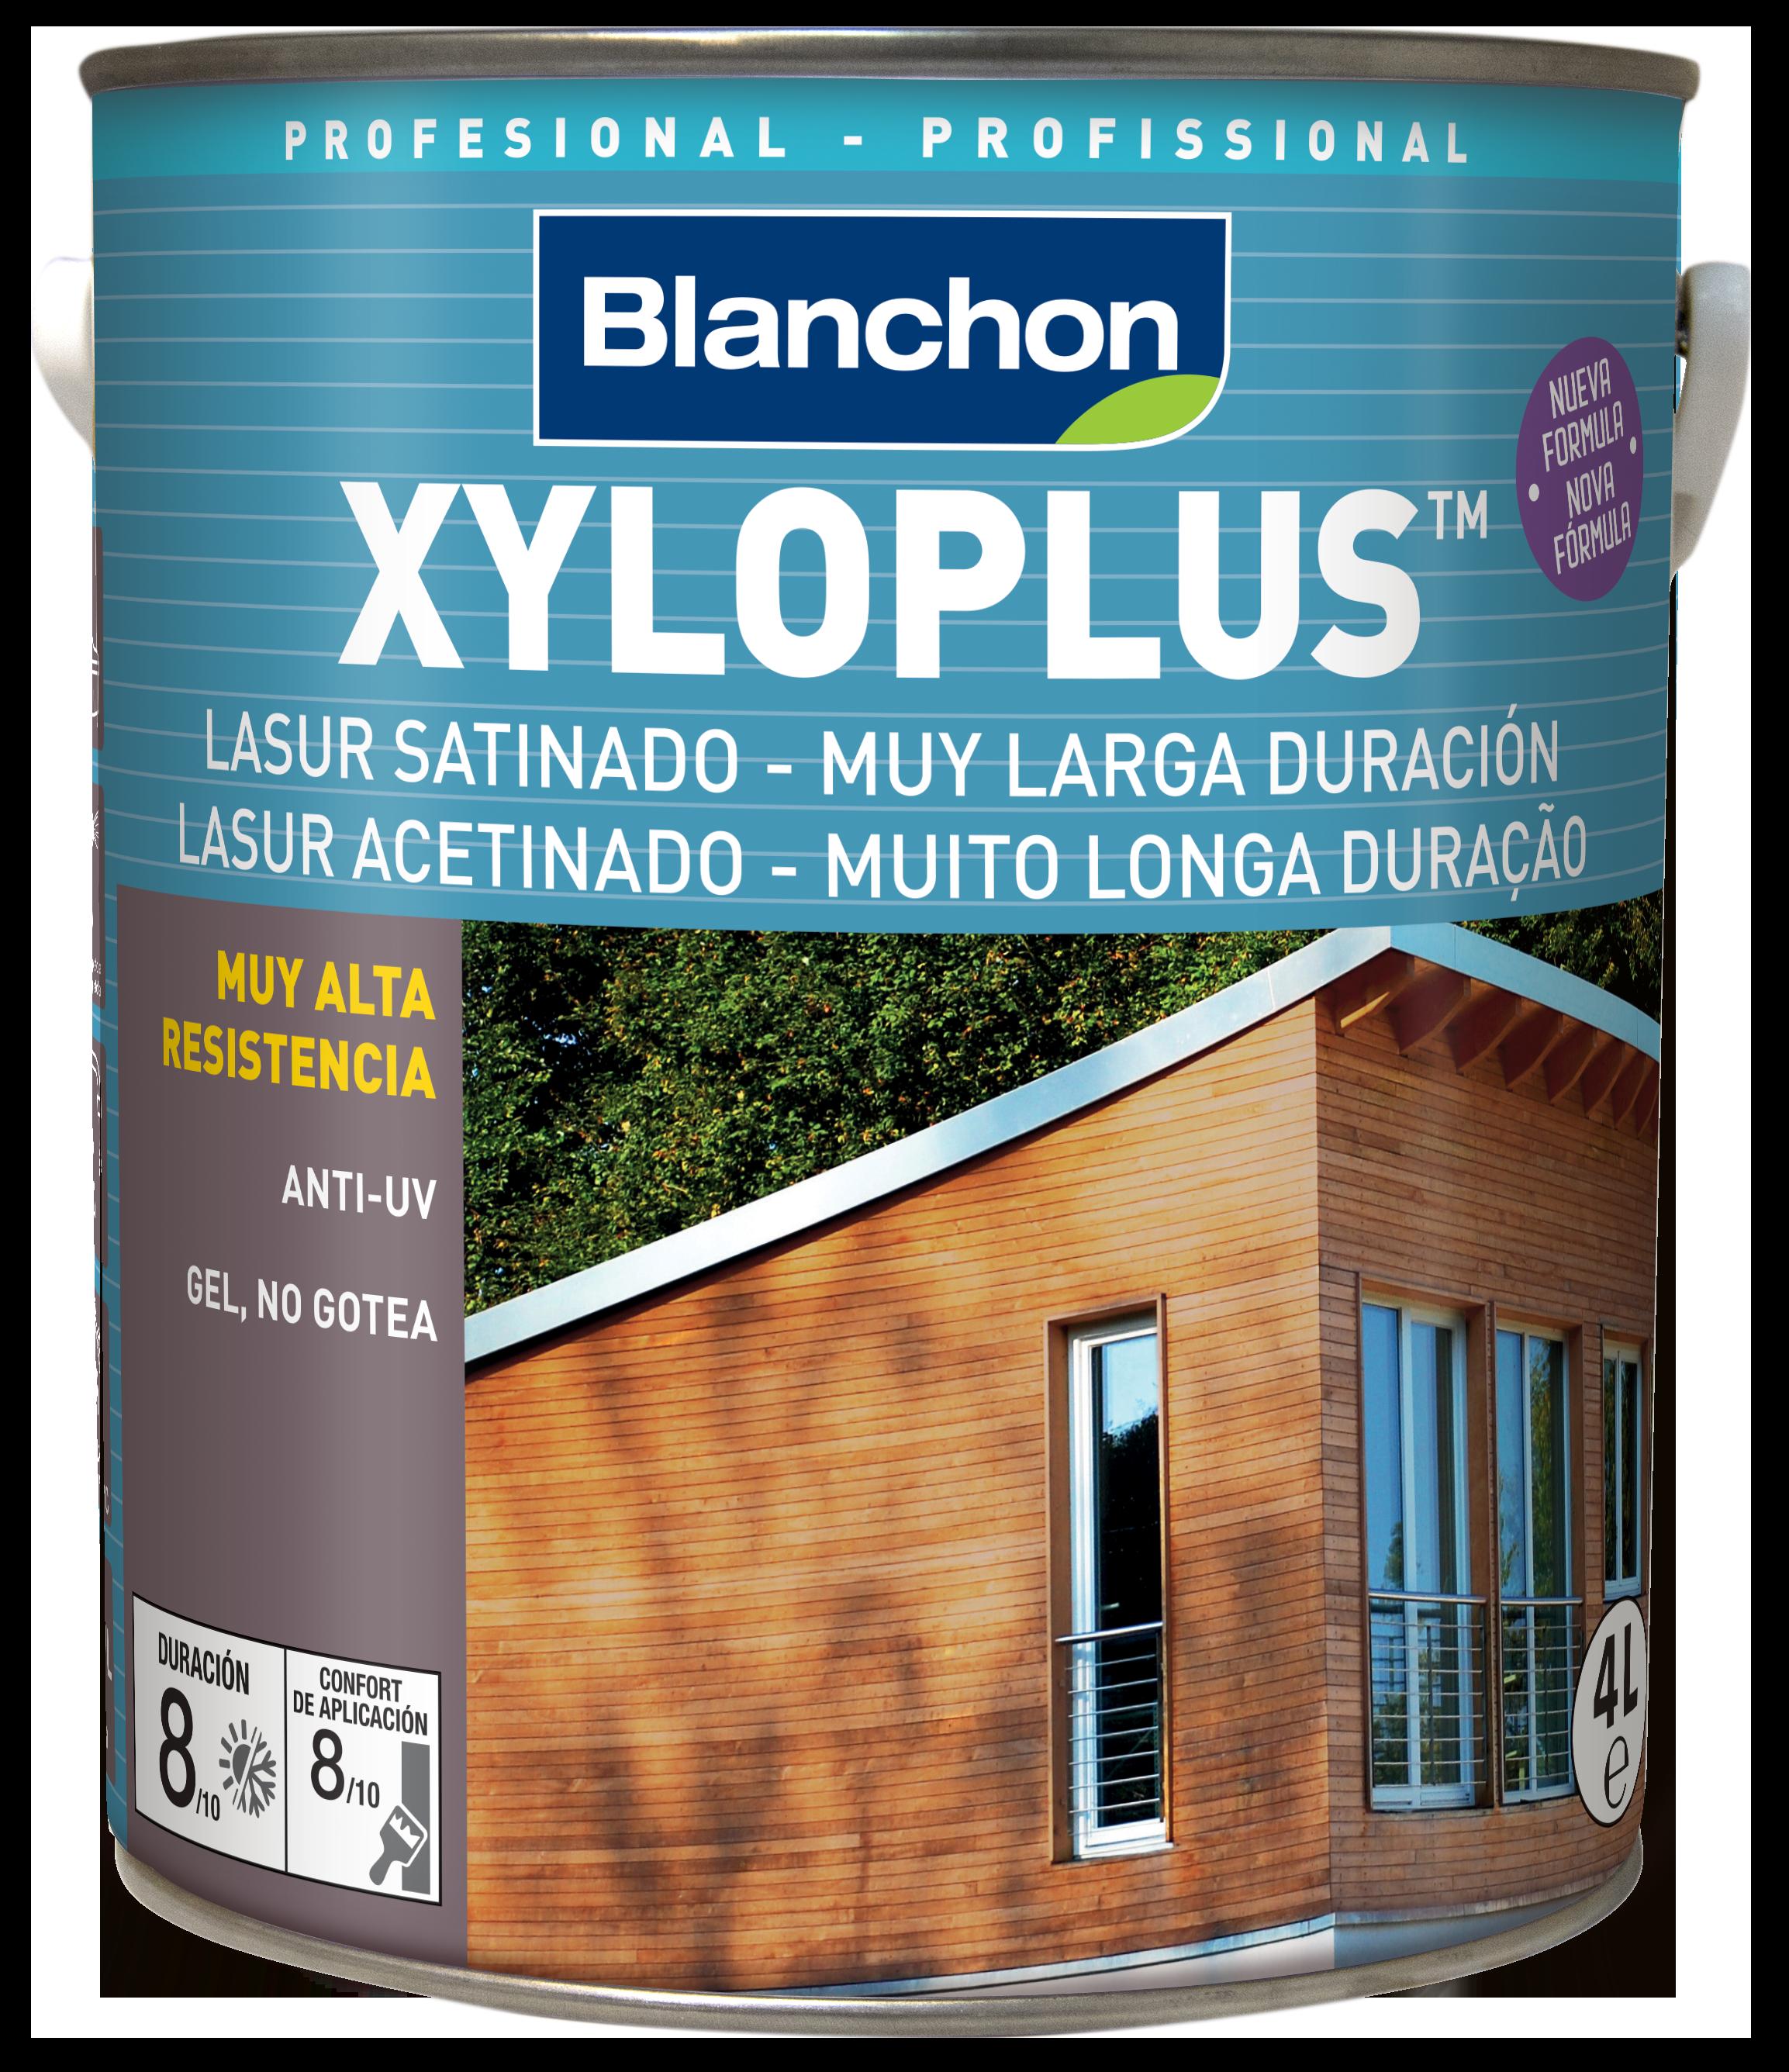 Xyloplus®